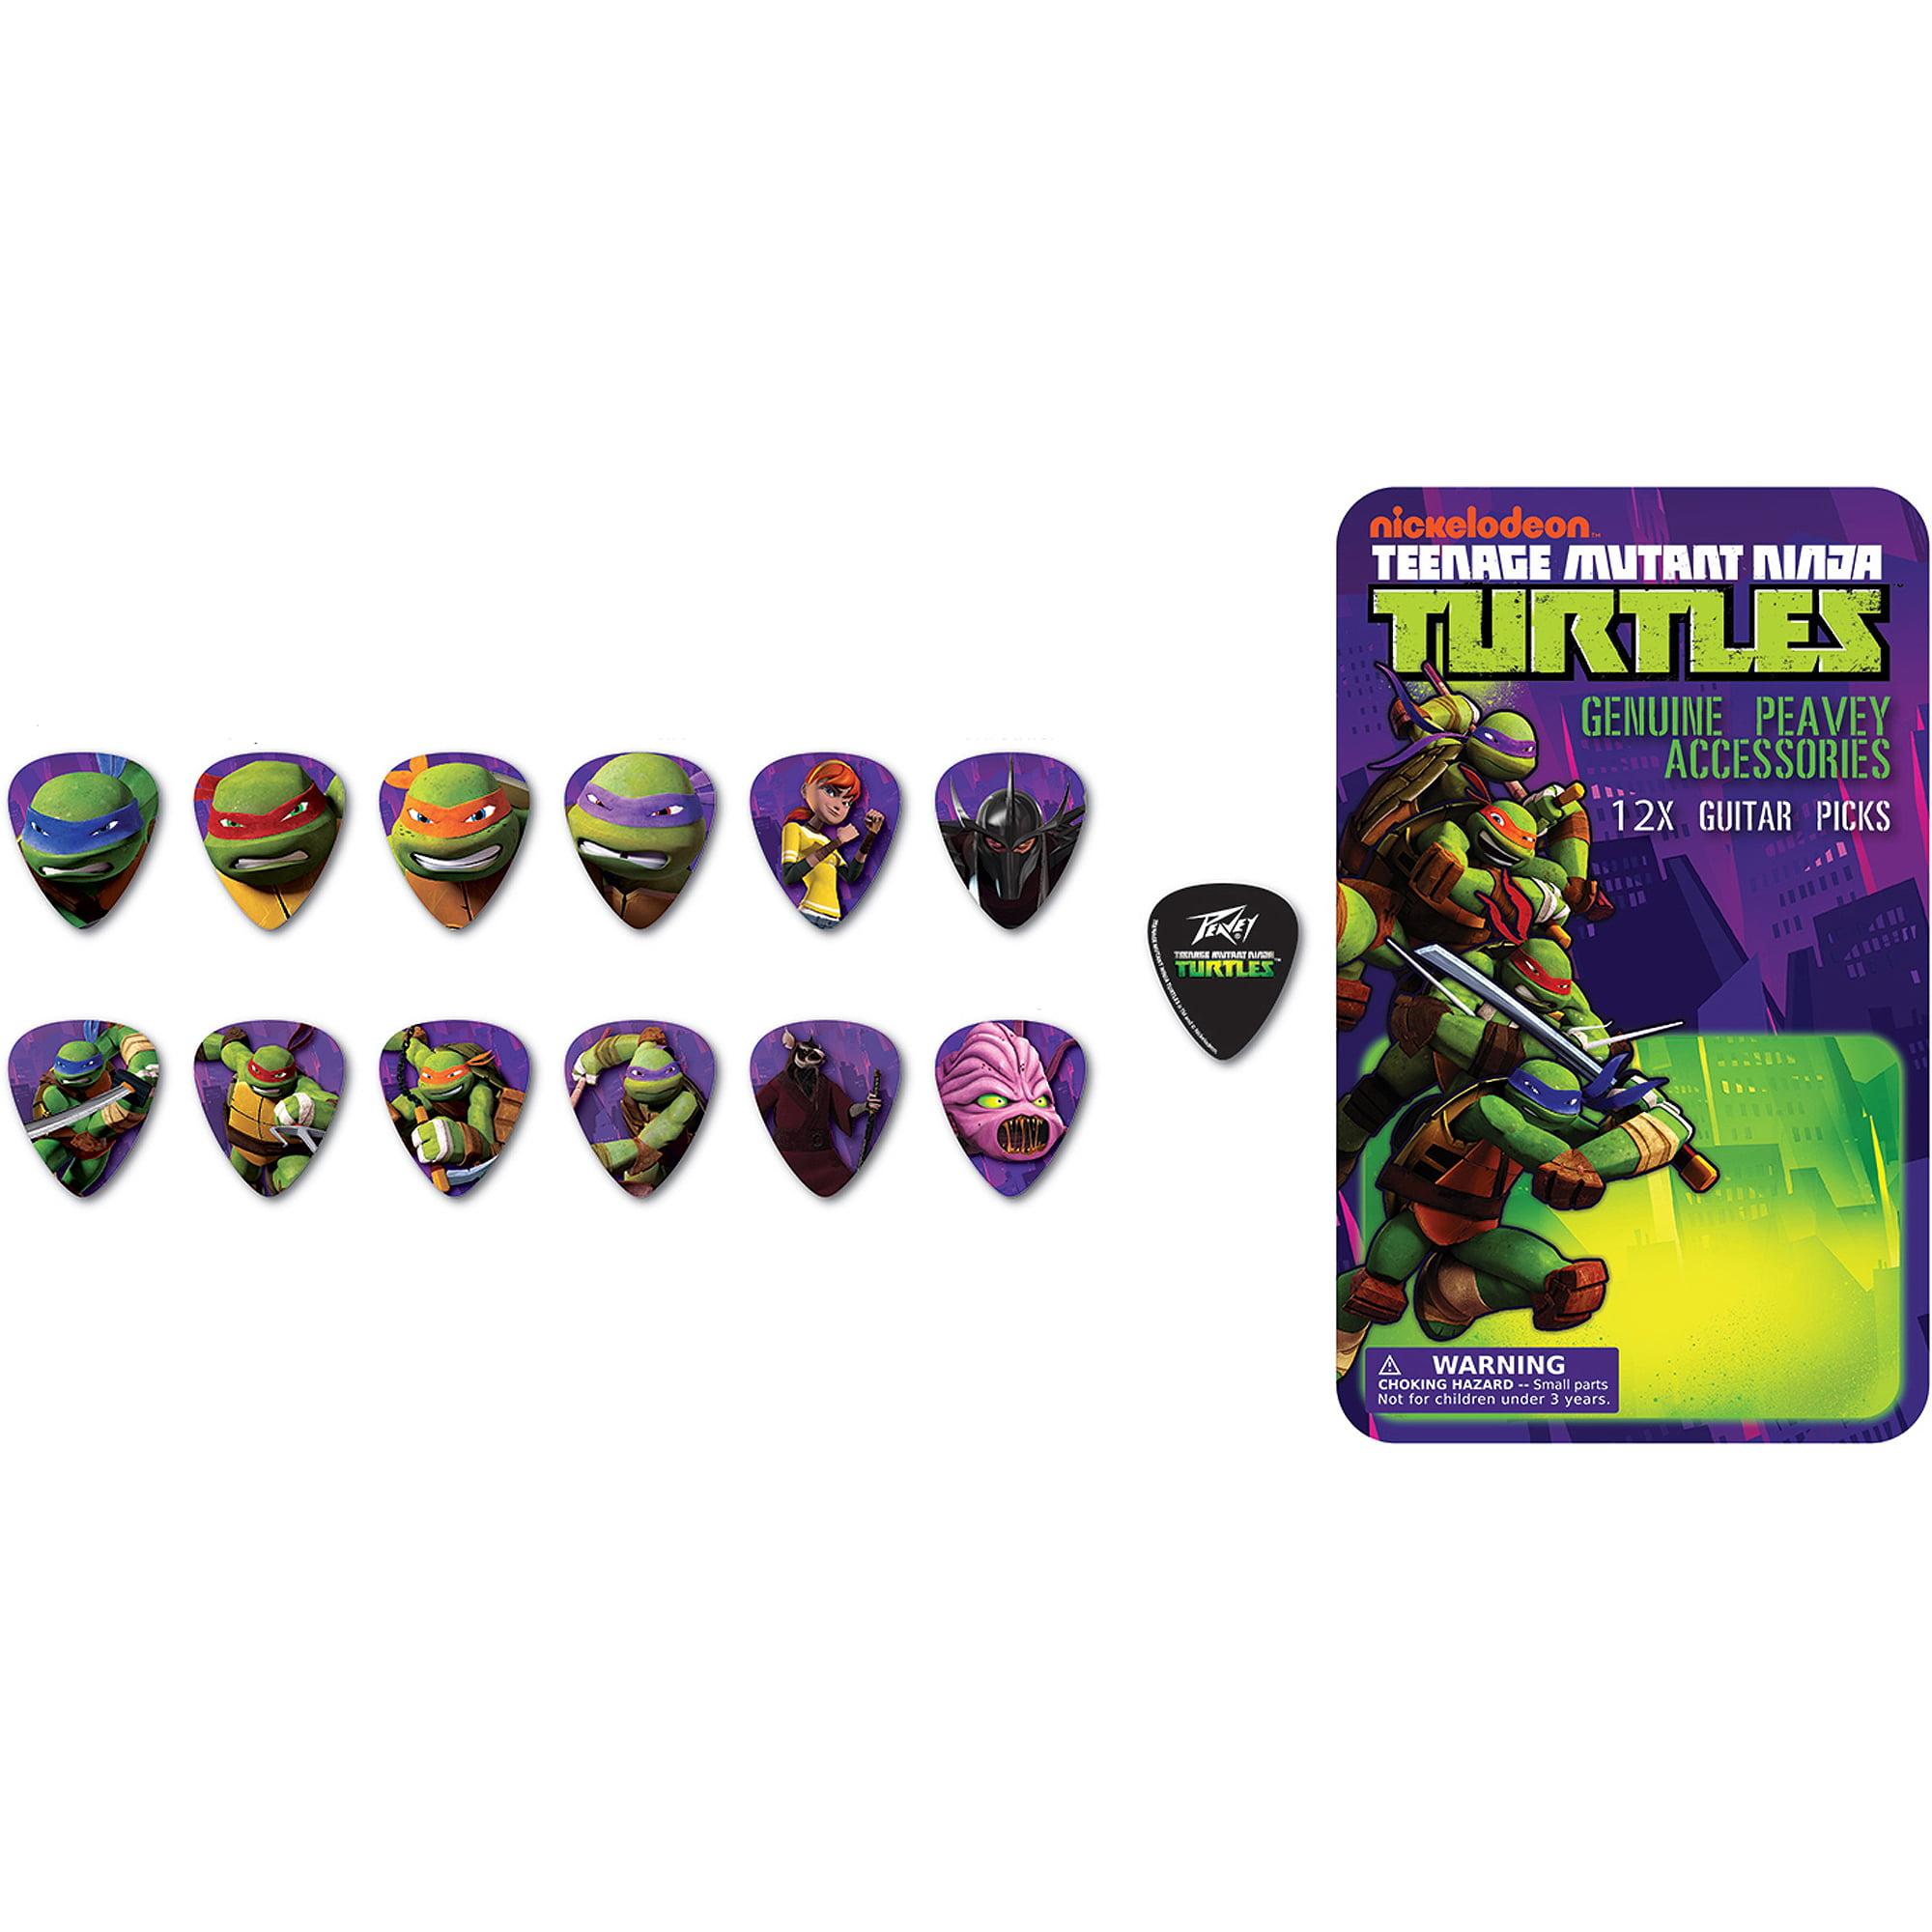 Peavey Nickelodeon Teenage Mutant Ninja Turtles Pick Pack